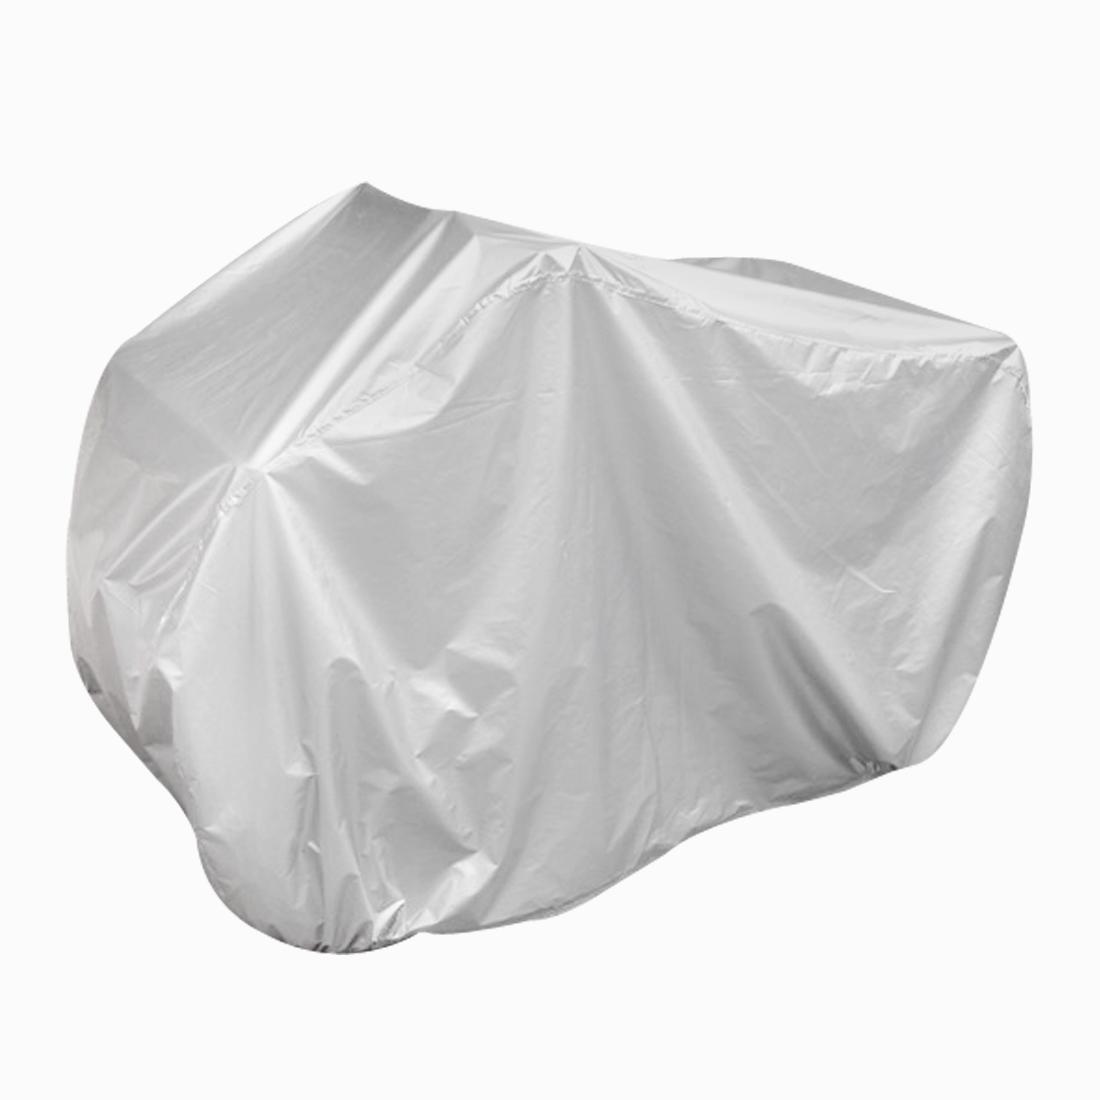 Silver Tone Rain Water Resistant Protective Quad Bike ATV Cover 256x110x120cm